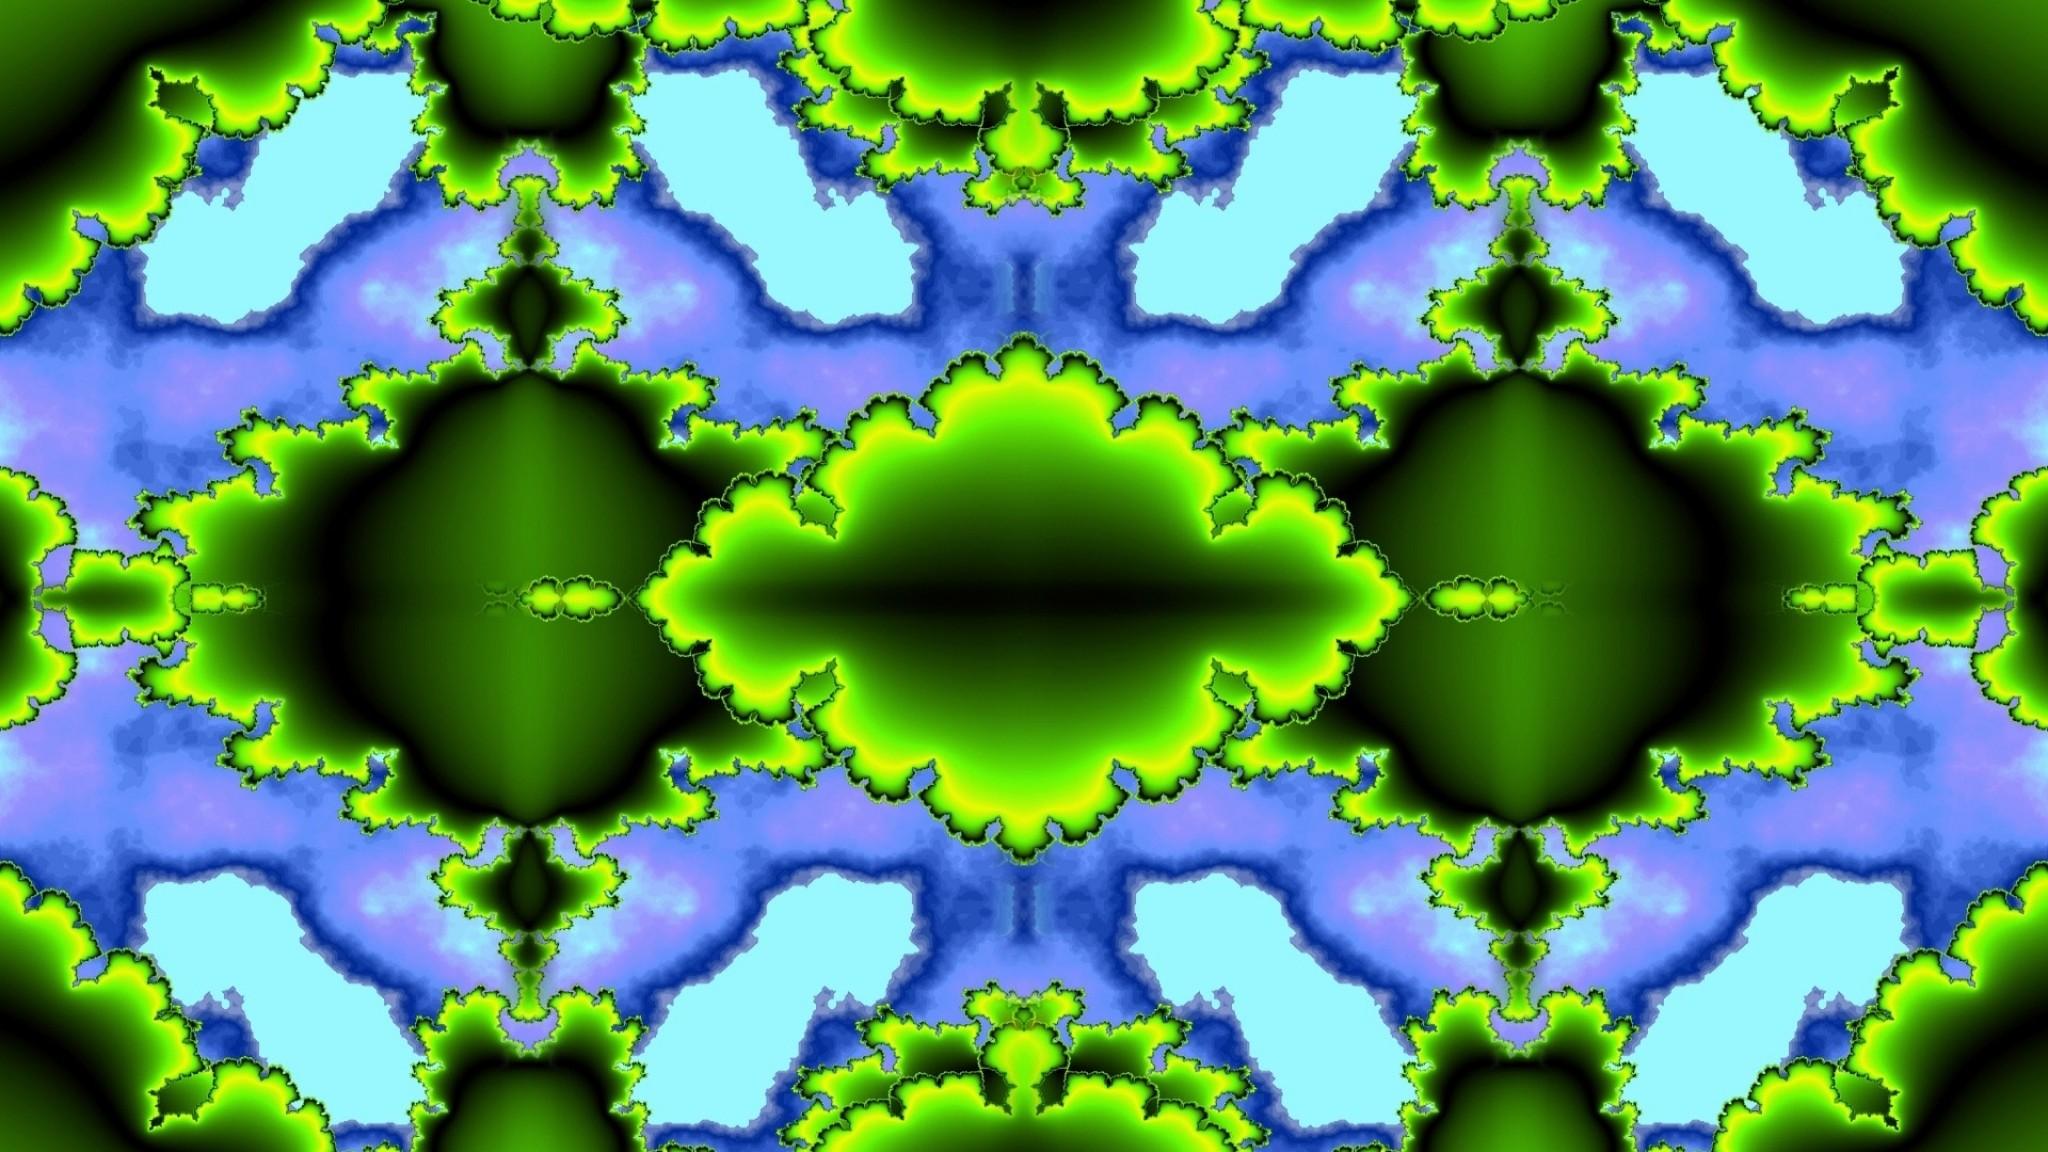 Wallpaper green, chaos, colorful, pixels